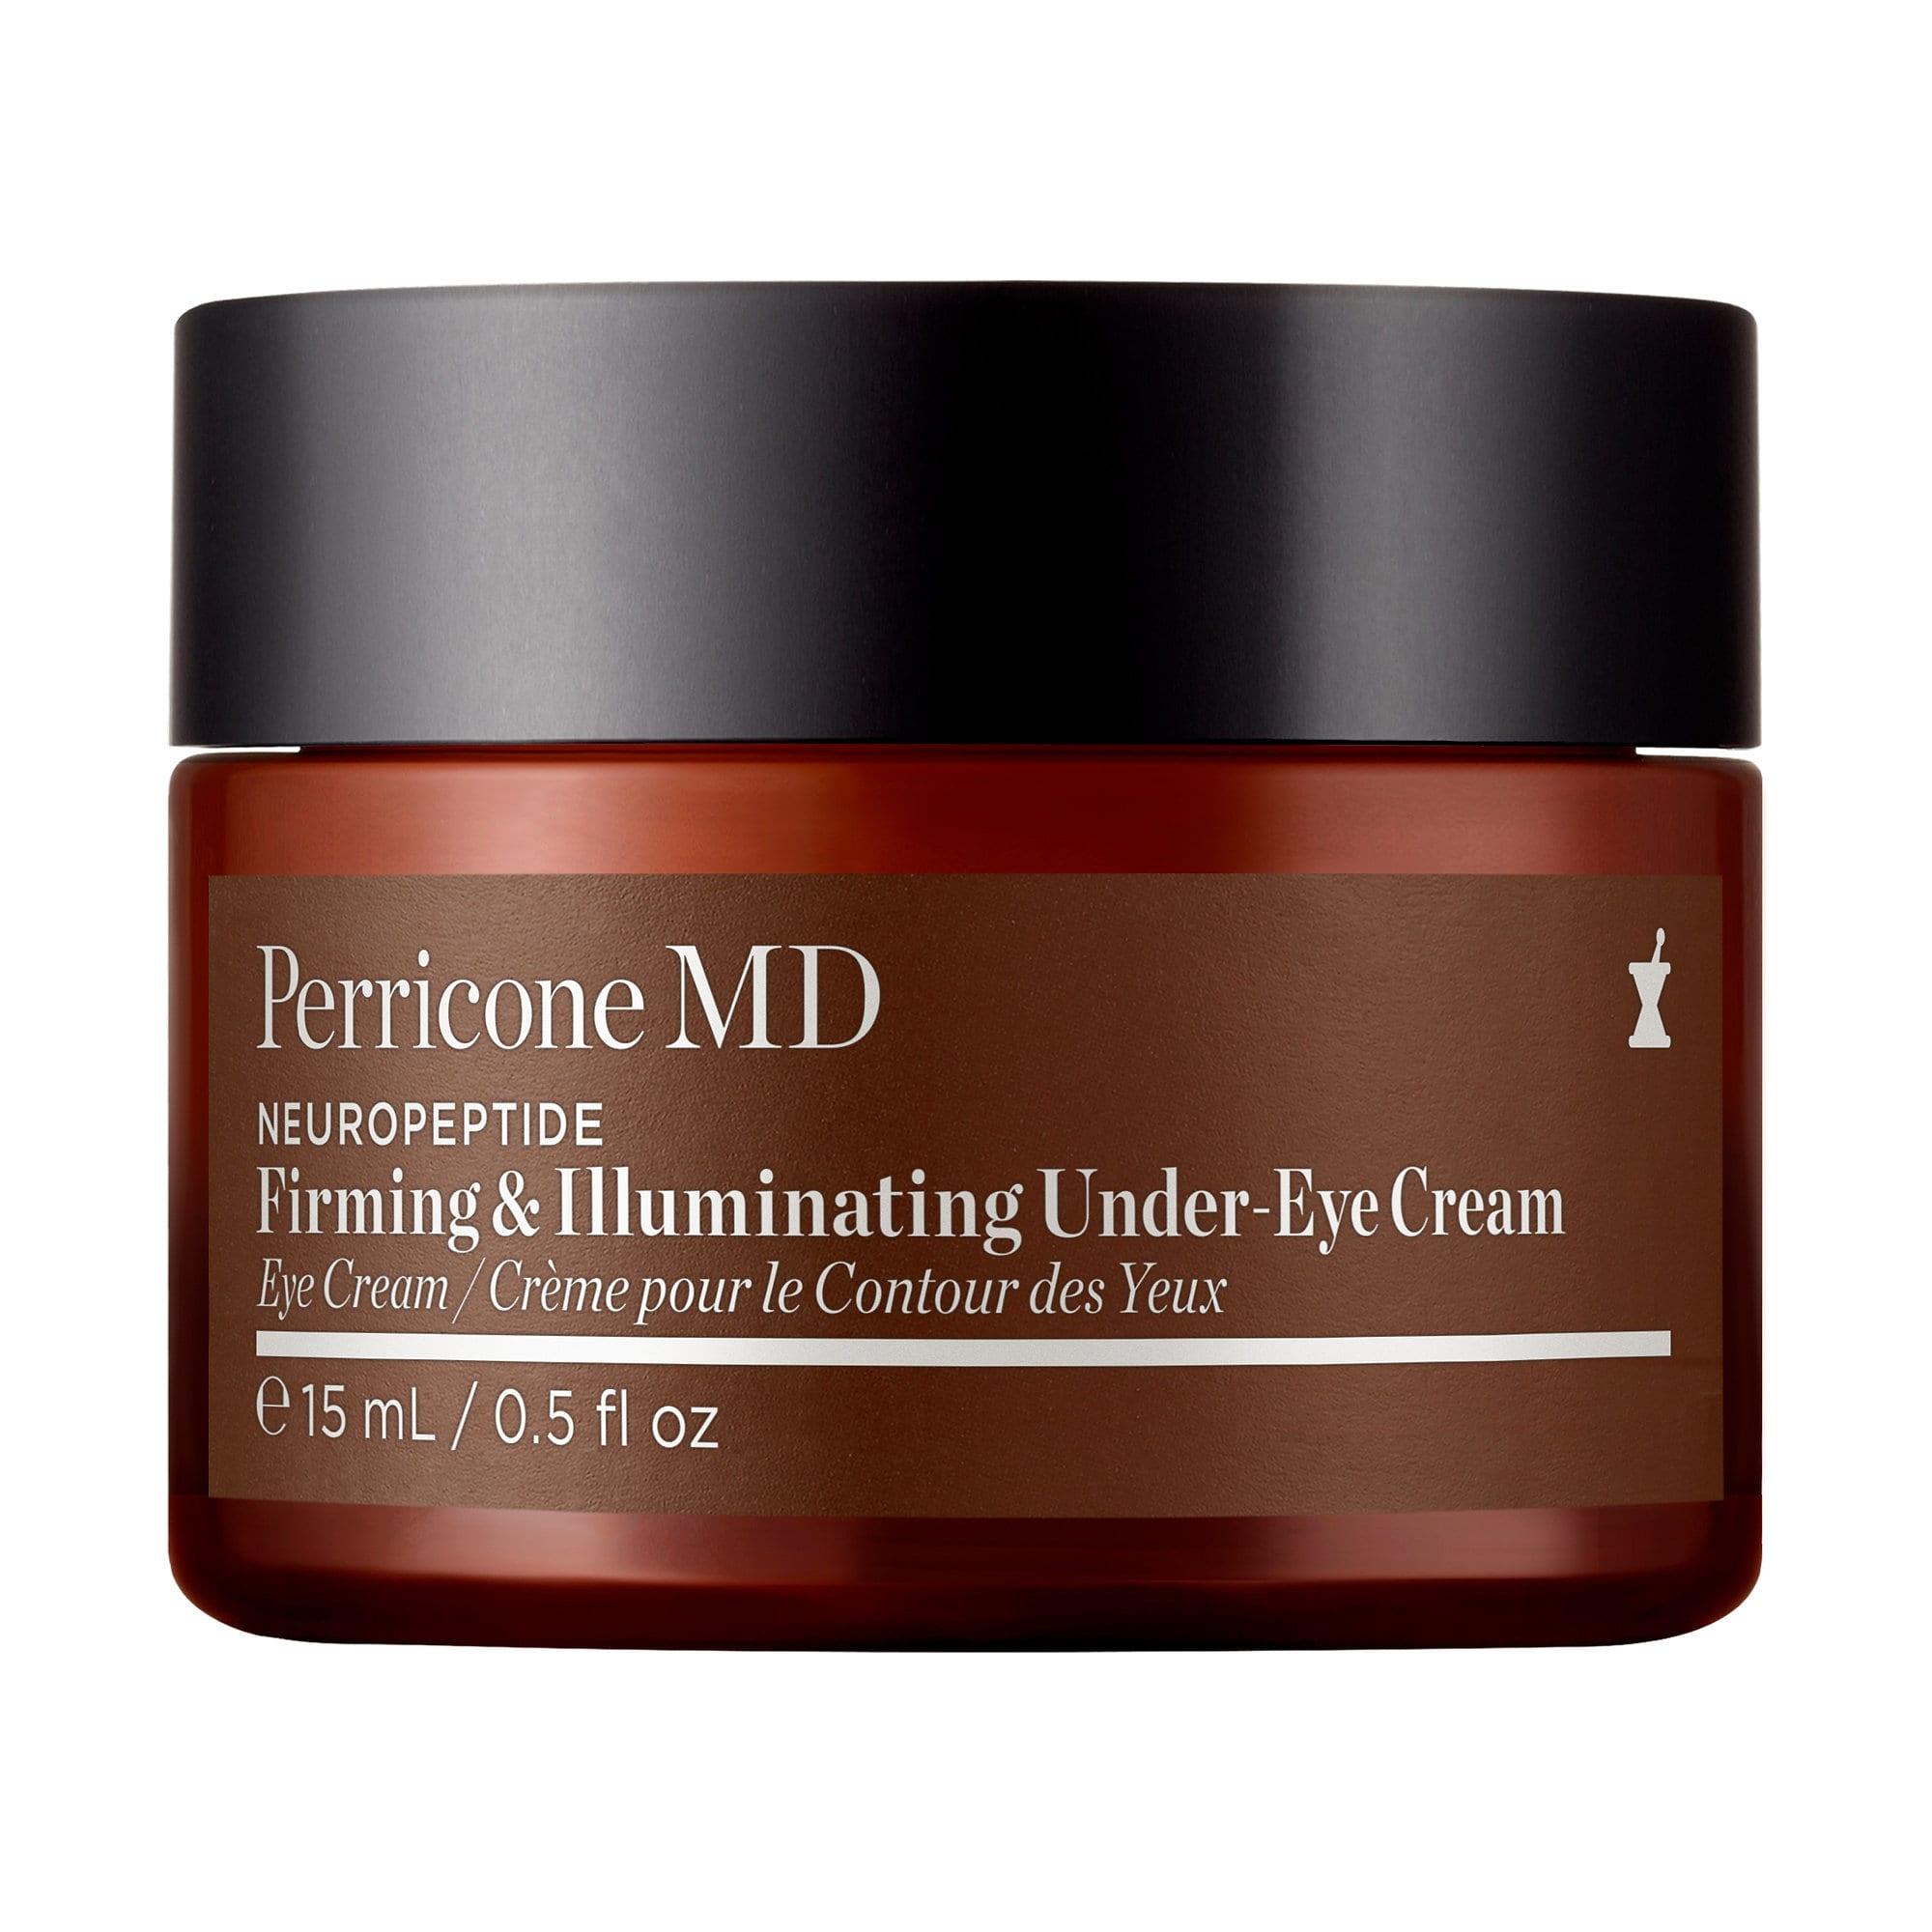 Perricone MD Neuropeptide Firming & Illuminating Under-Eye Cream